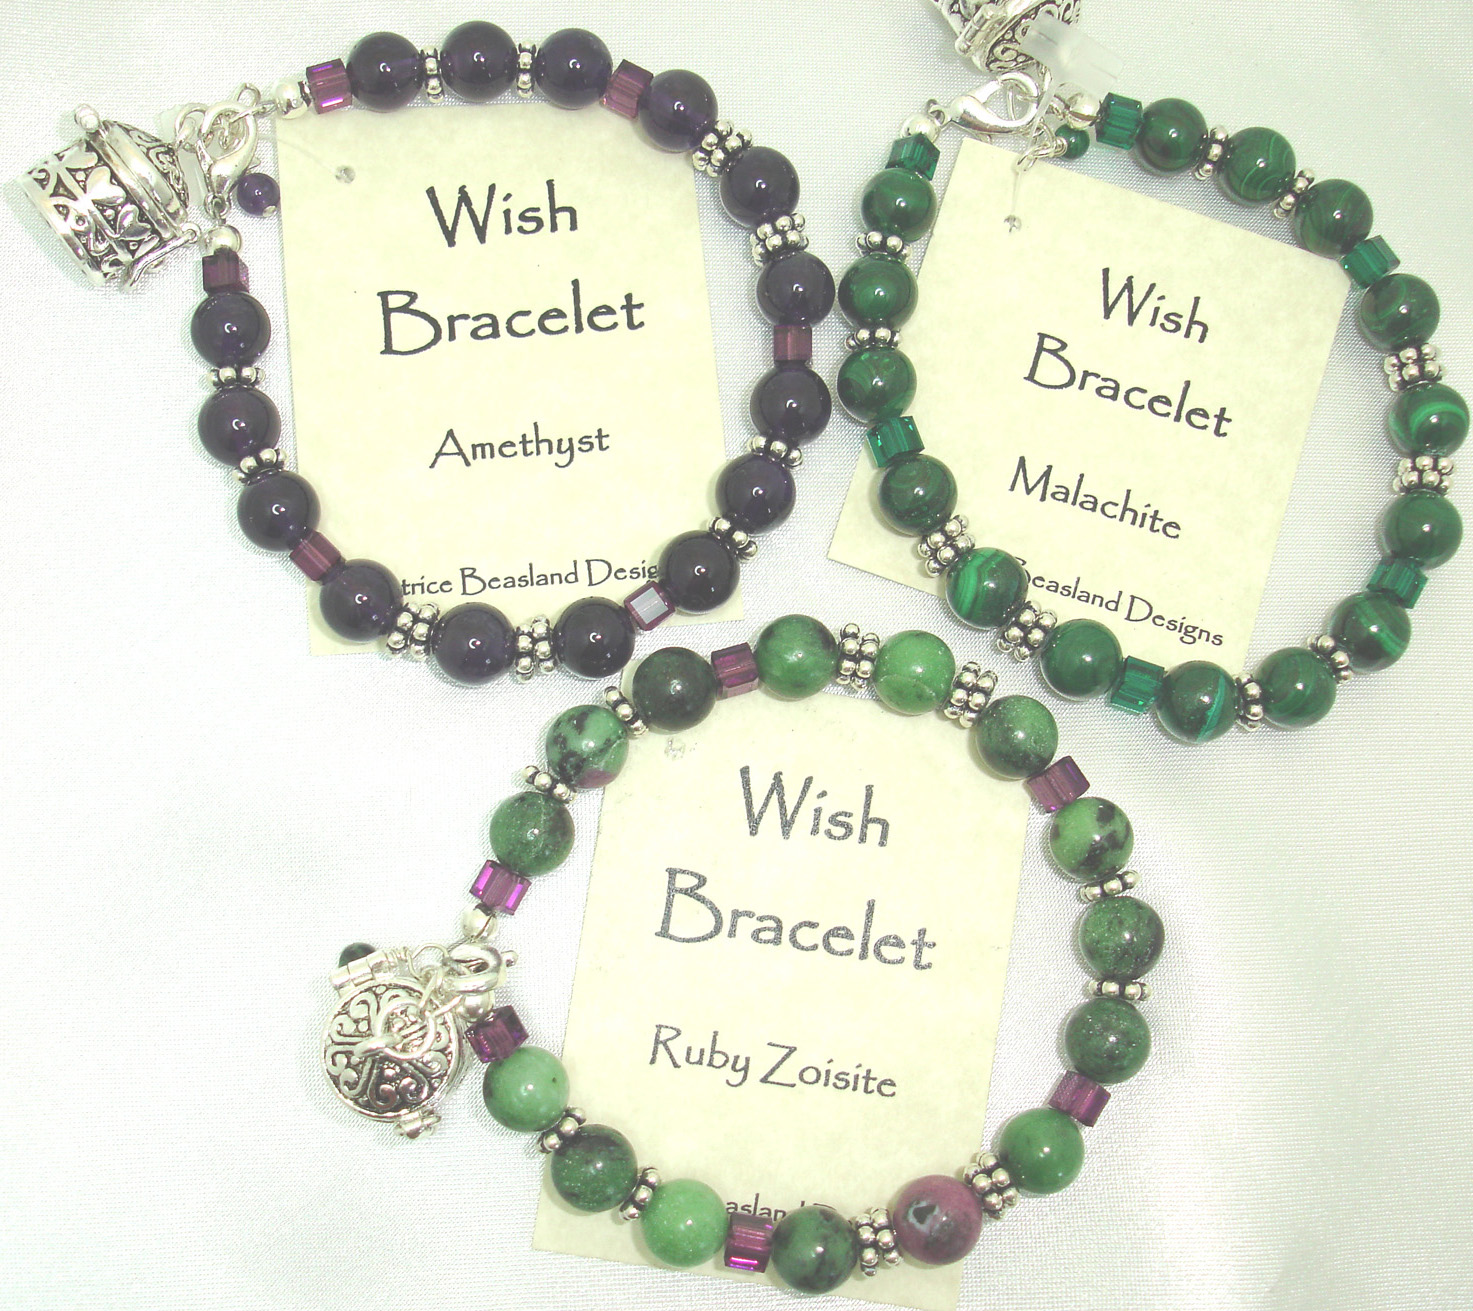 Patrice Beasland: Wish Bracelets